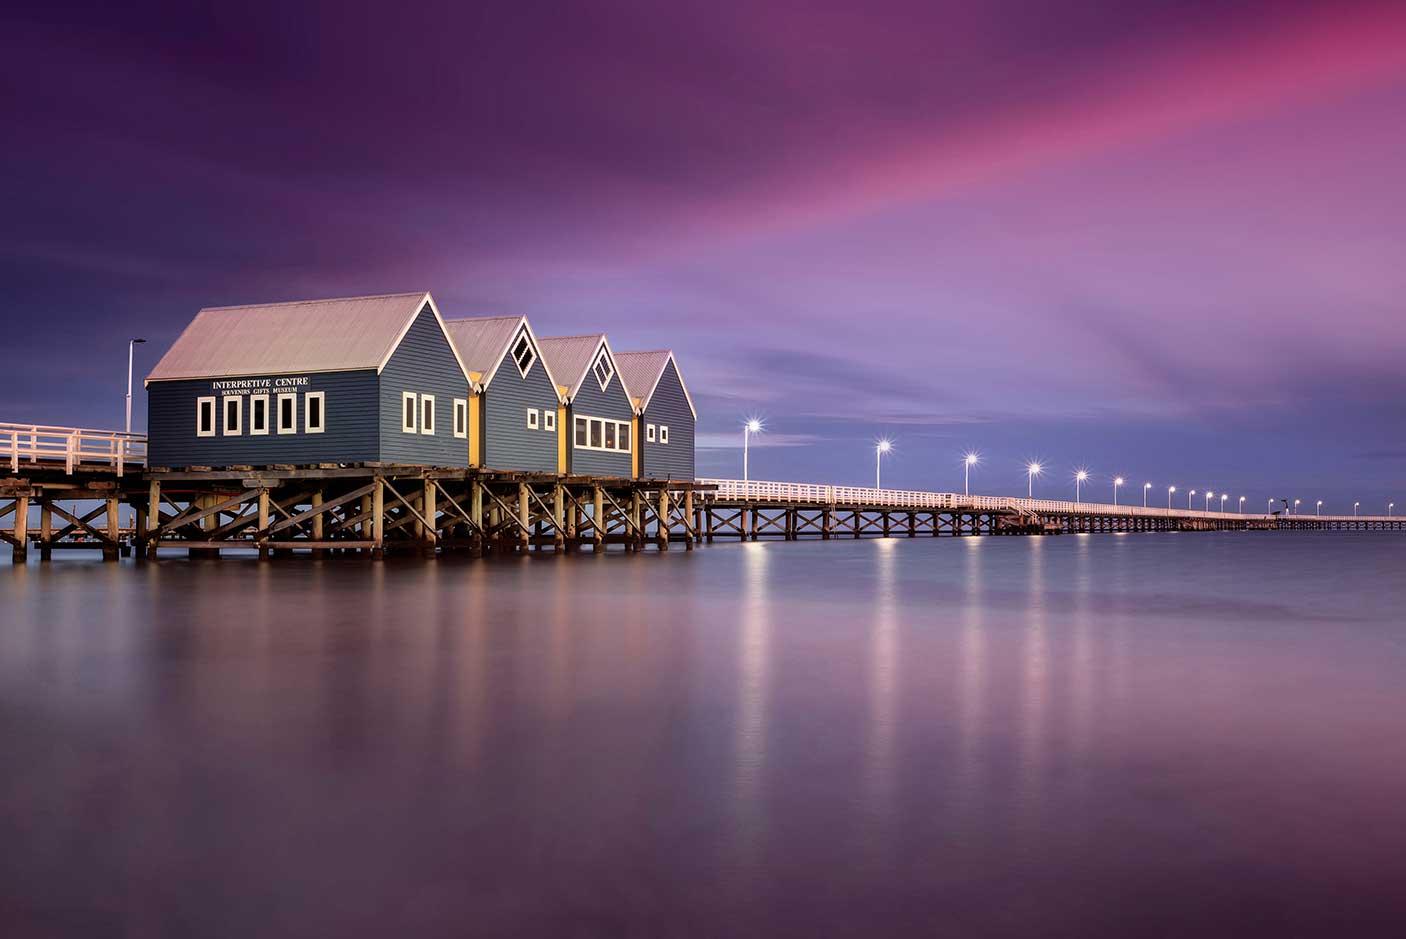 Sunrise at Busselton Jetty, Busselton, Western Australia